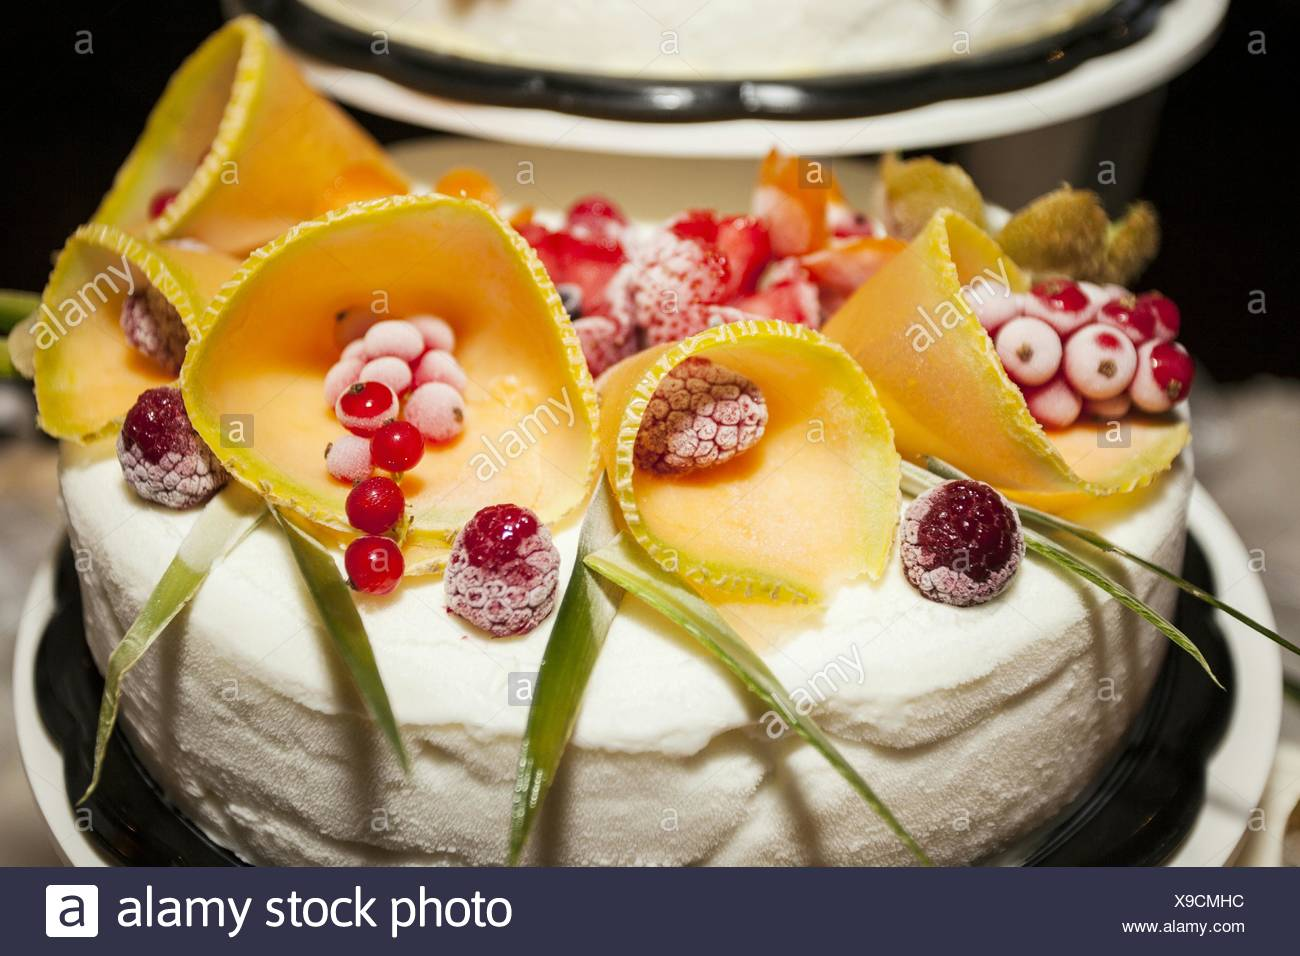 Close-Up Of Wedding Cake On Table Stock Photo: 281177384 - Alamy